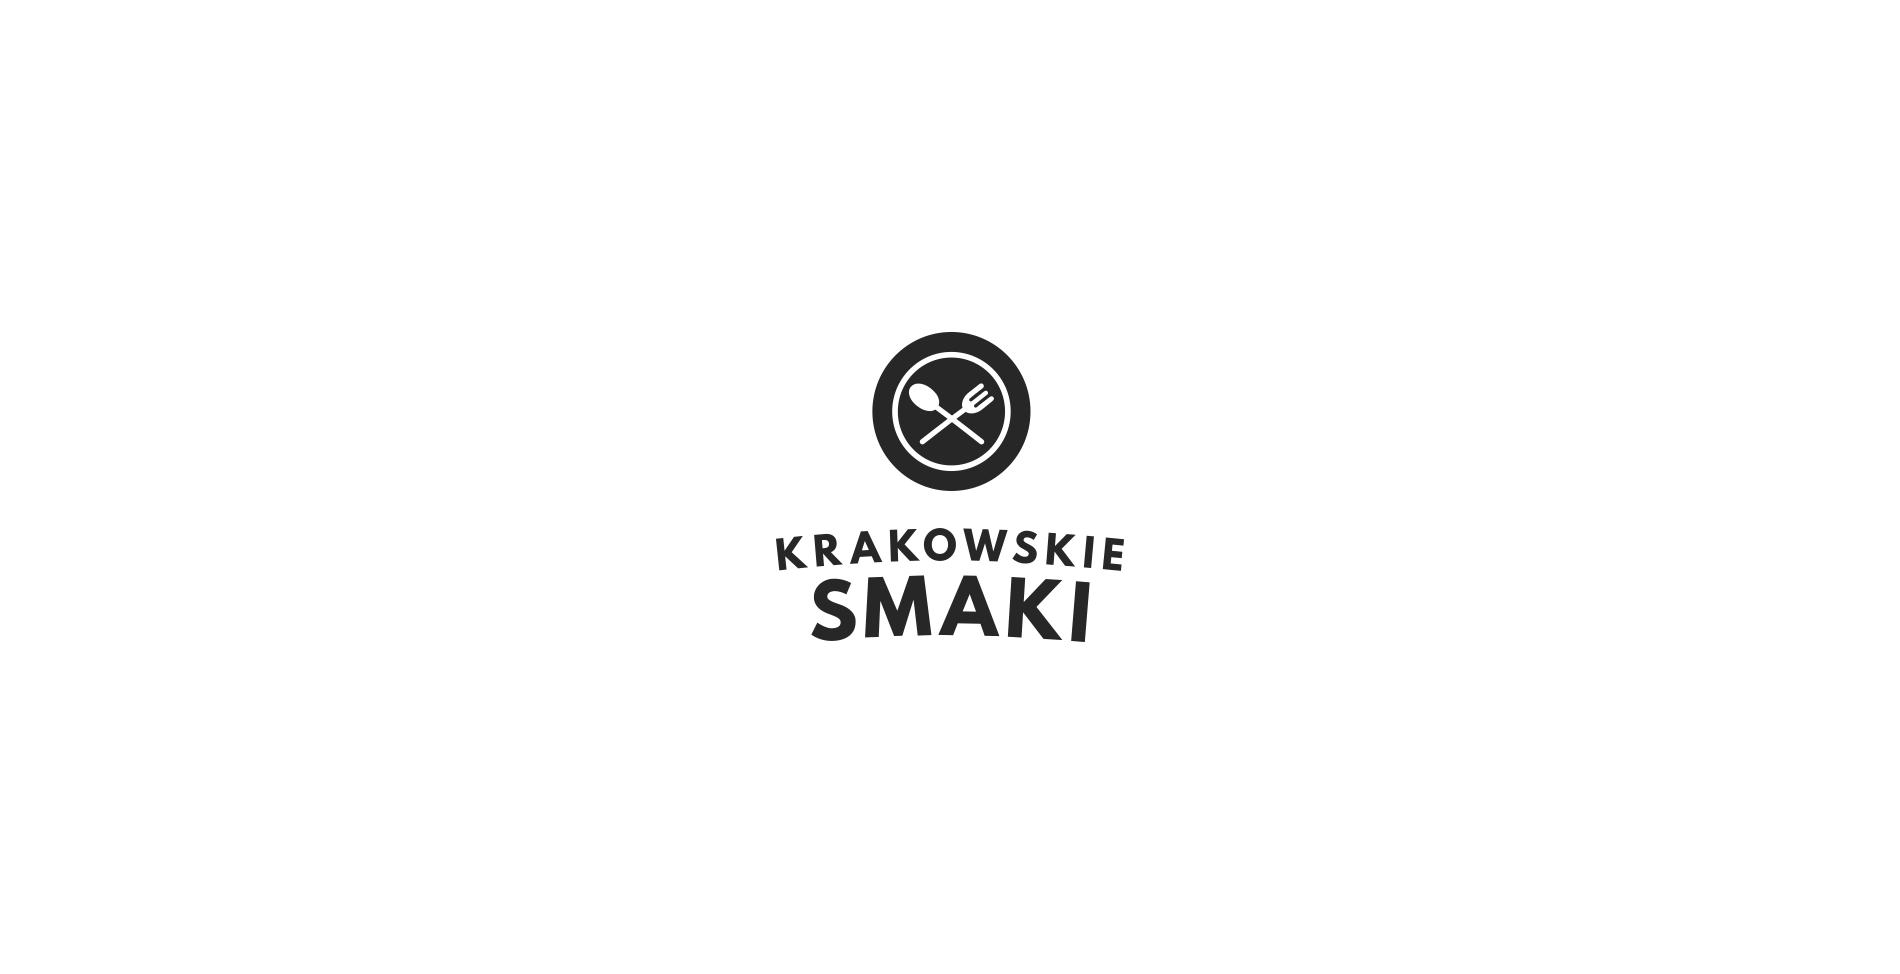 krakowskiesmaki